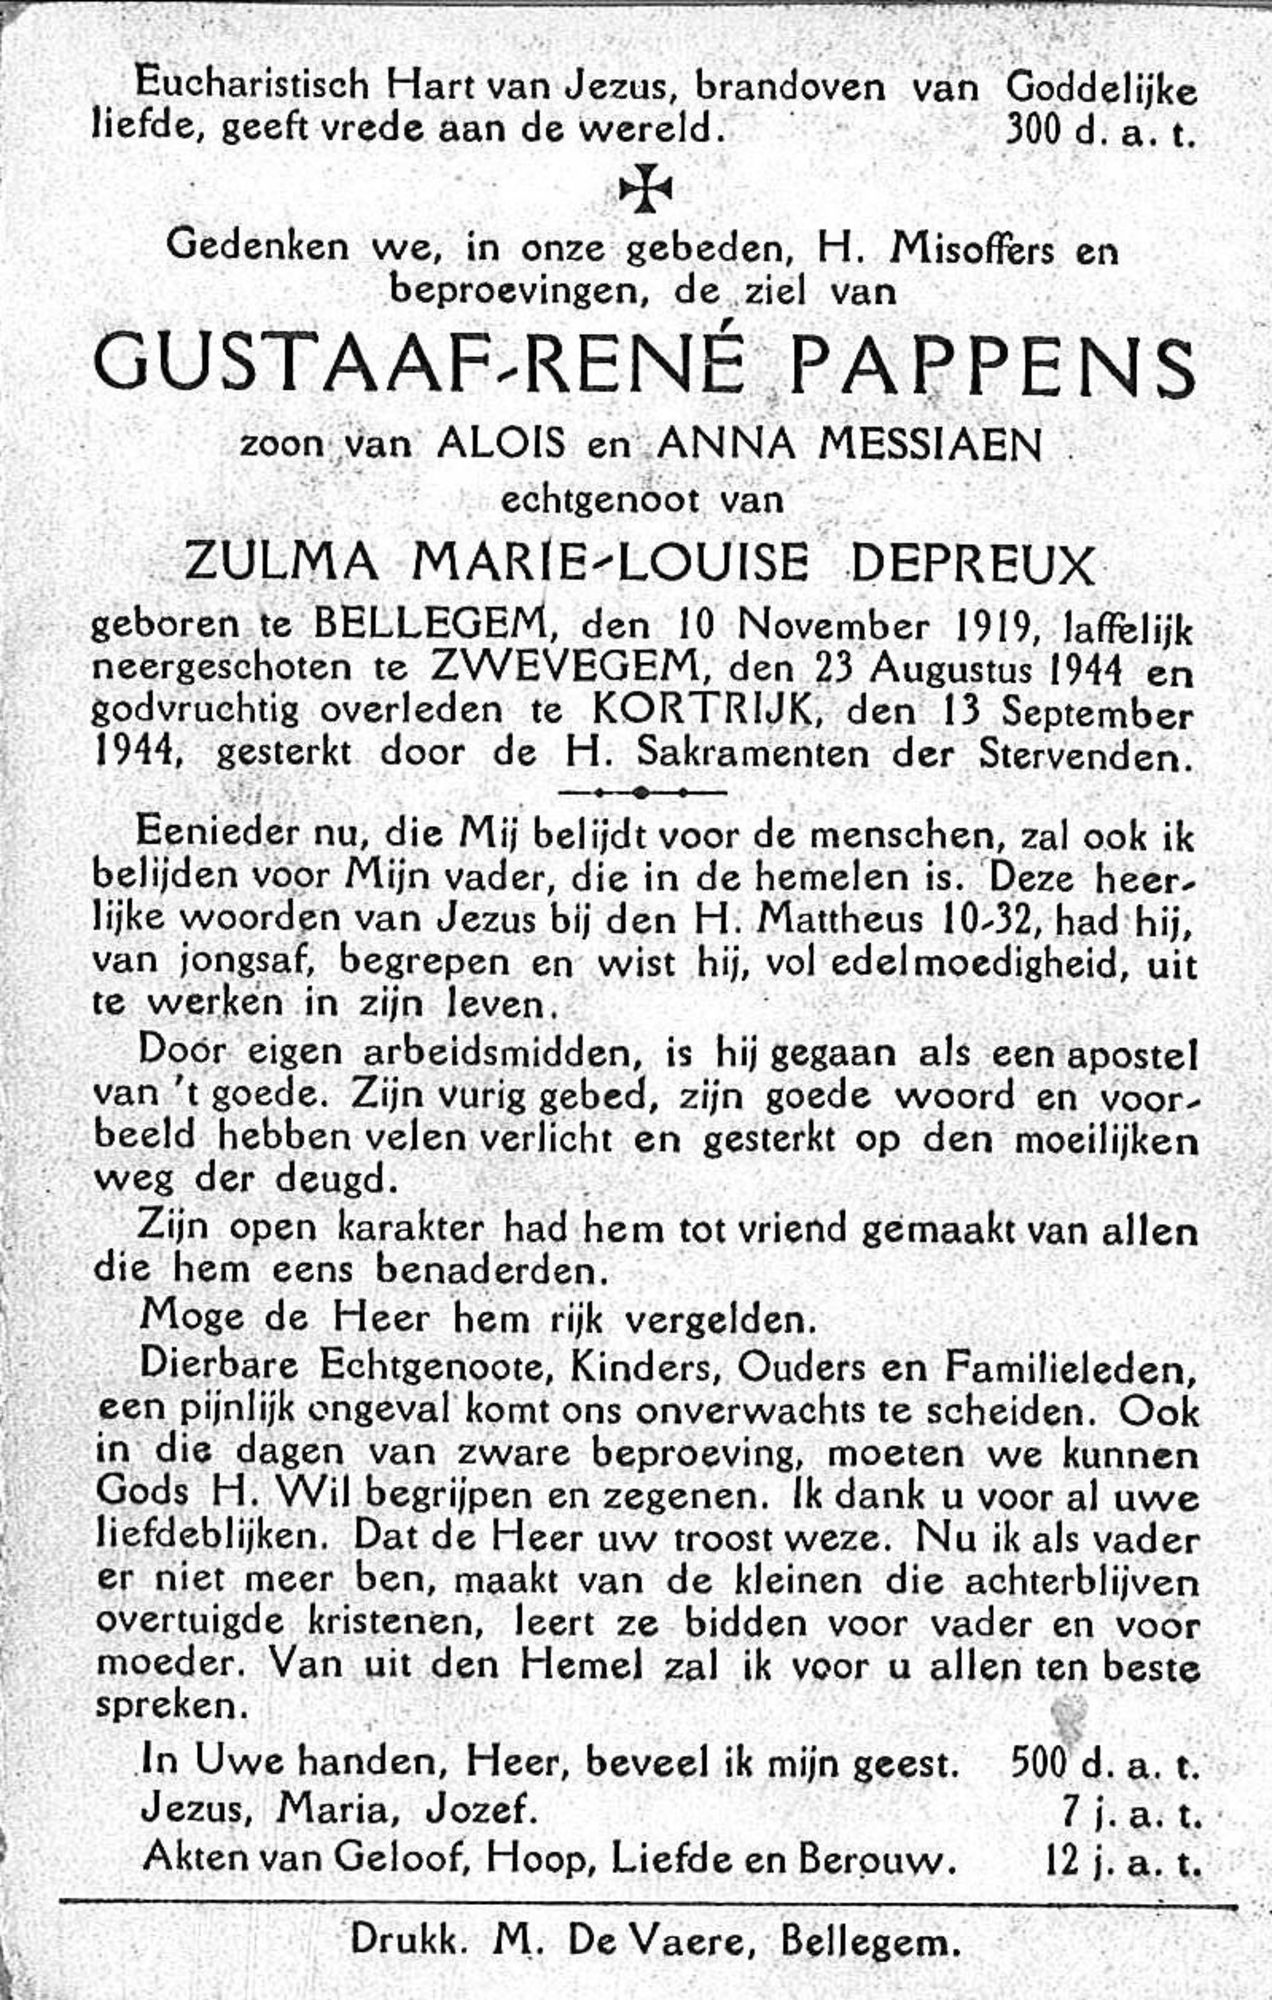 Gustaaf-René Pappens